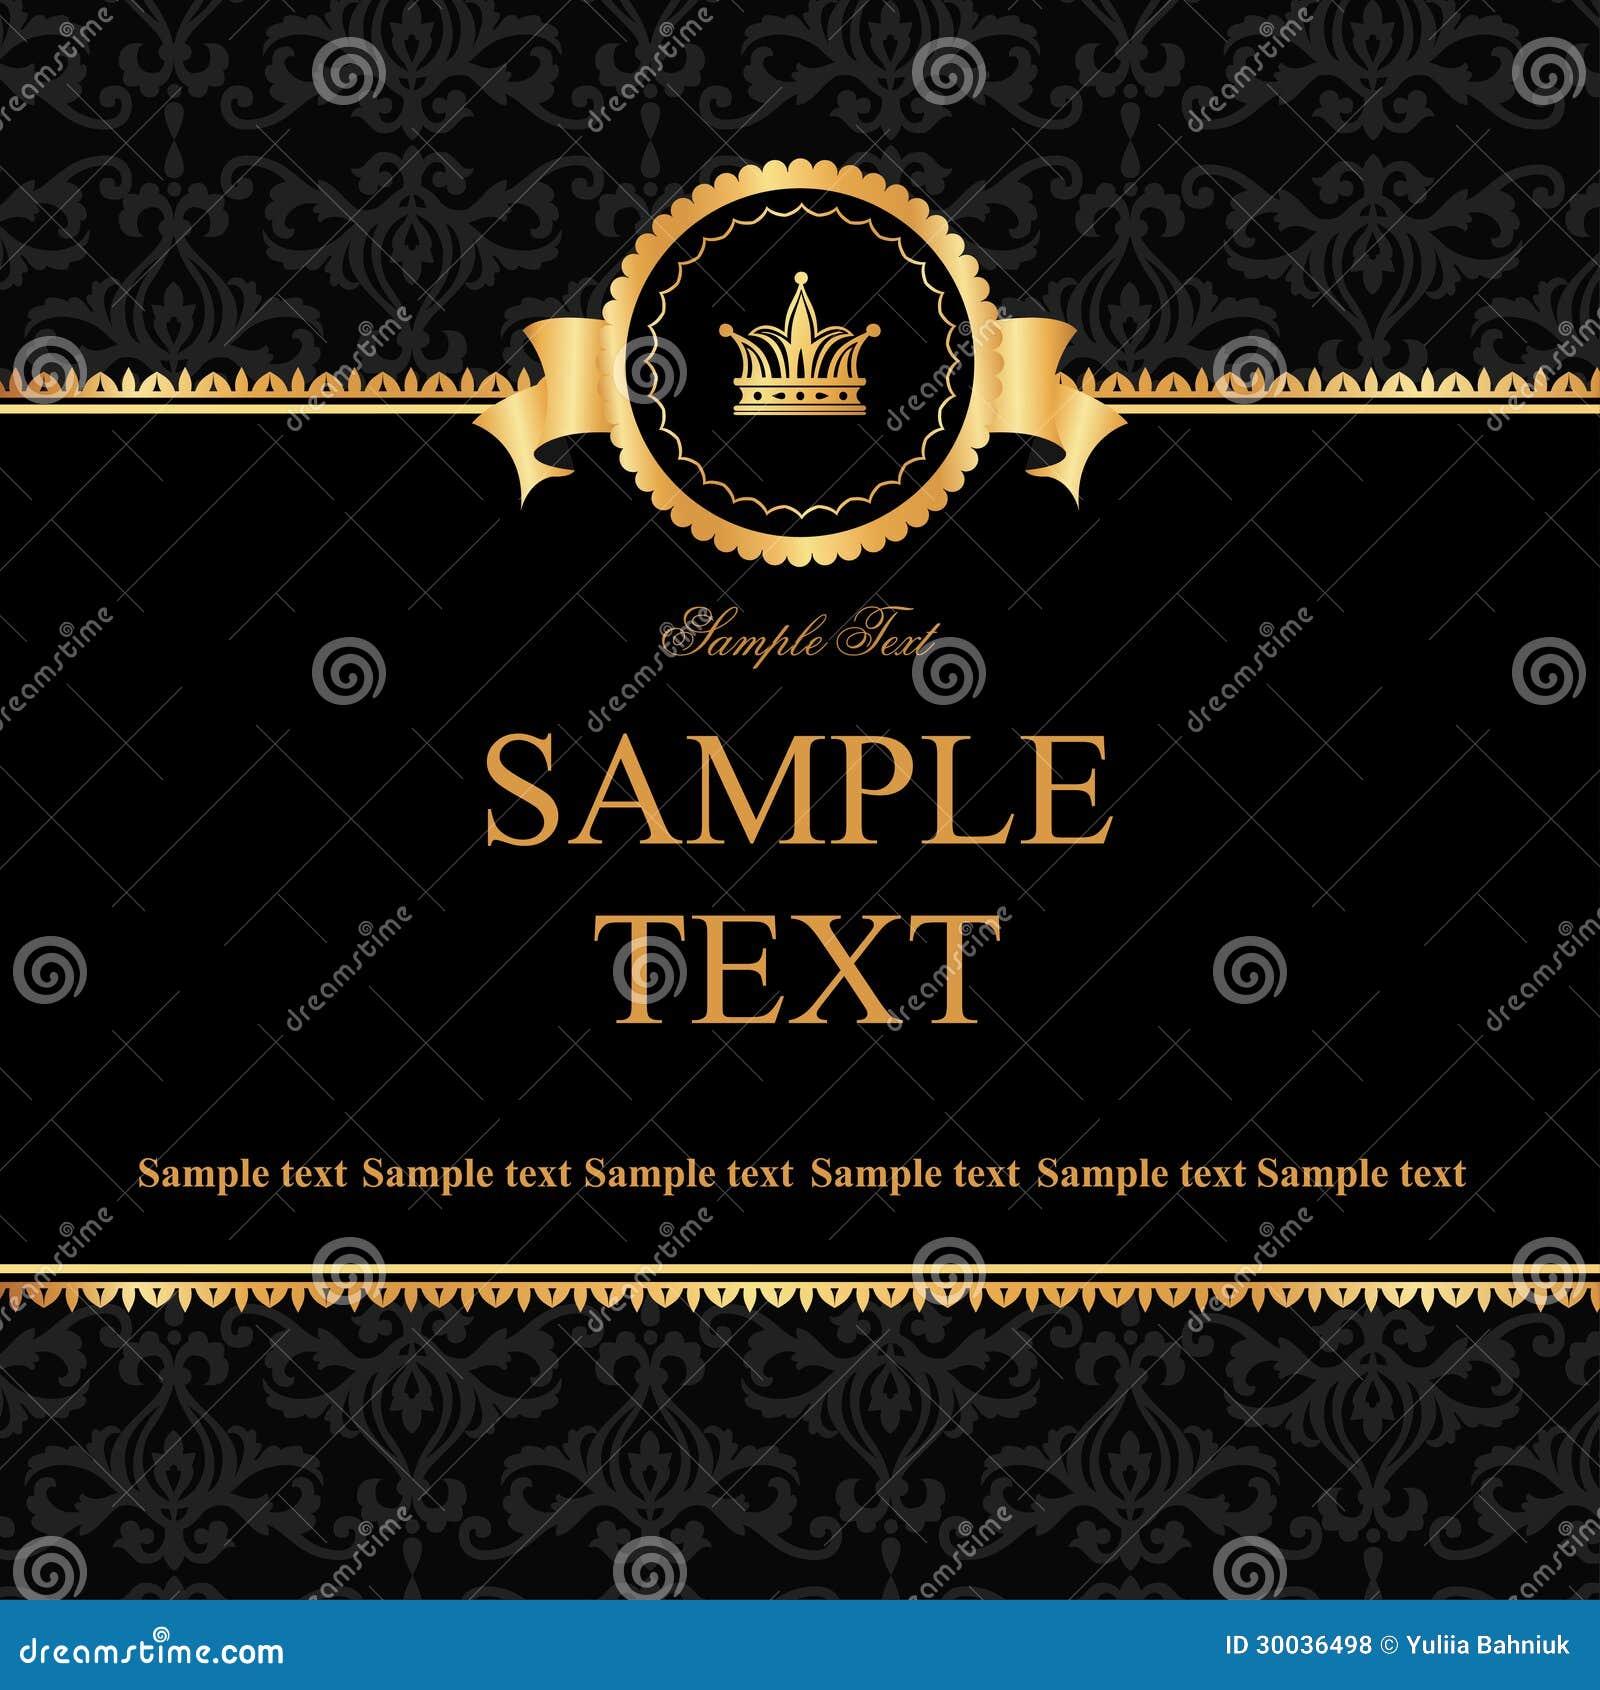 78ca04bfd991 Vintage black damask background with frame of golden elements for text